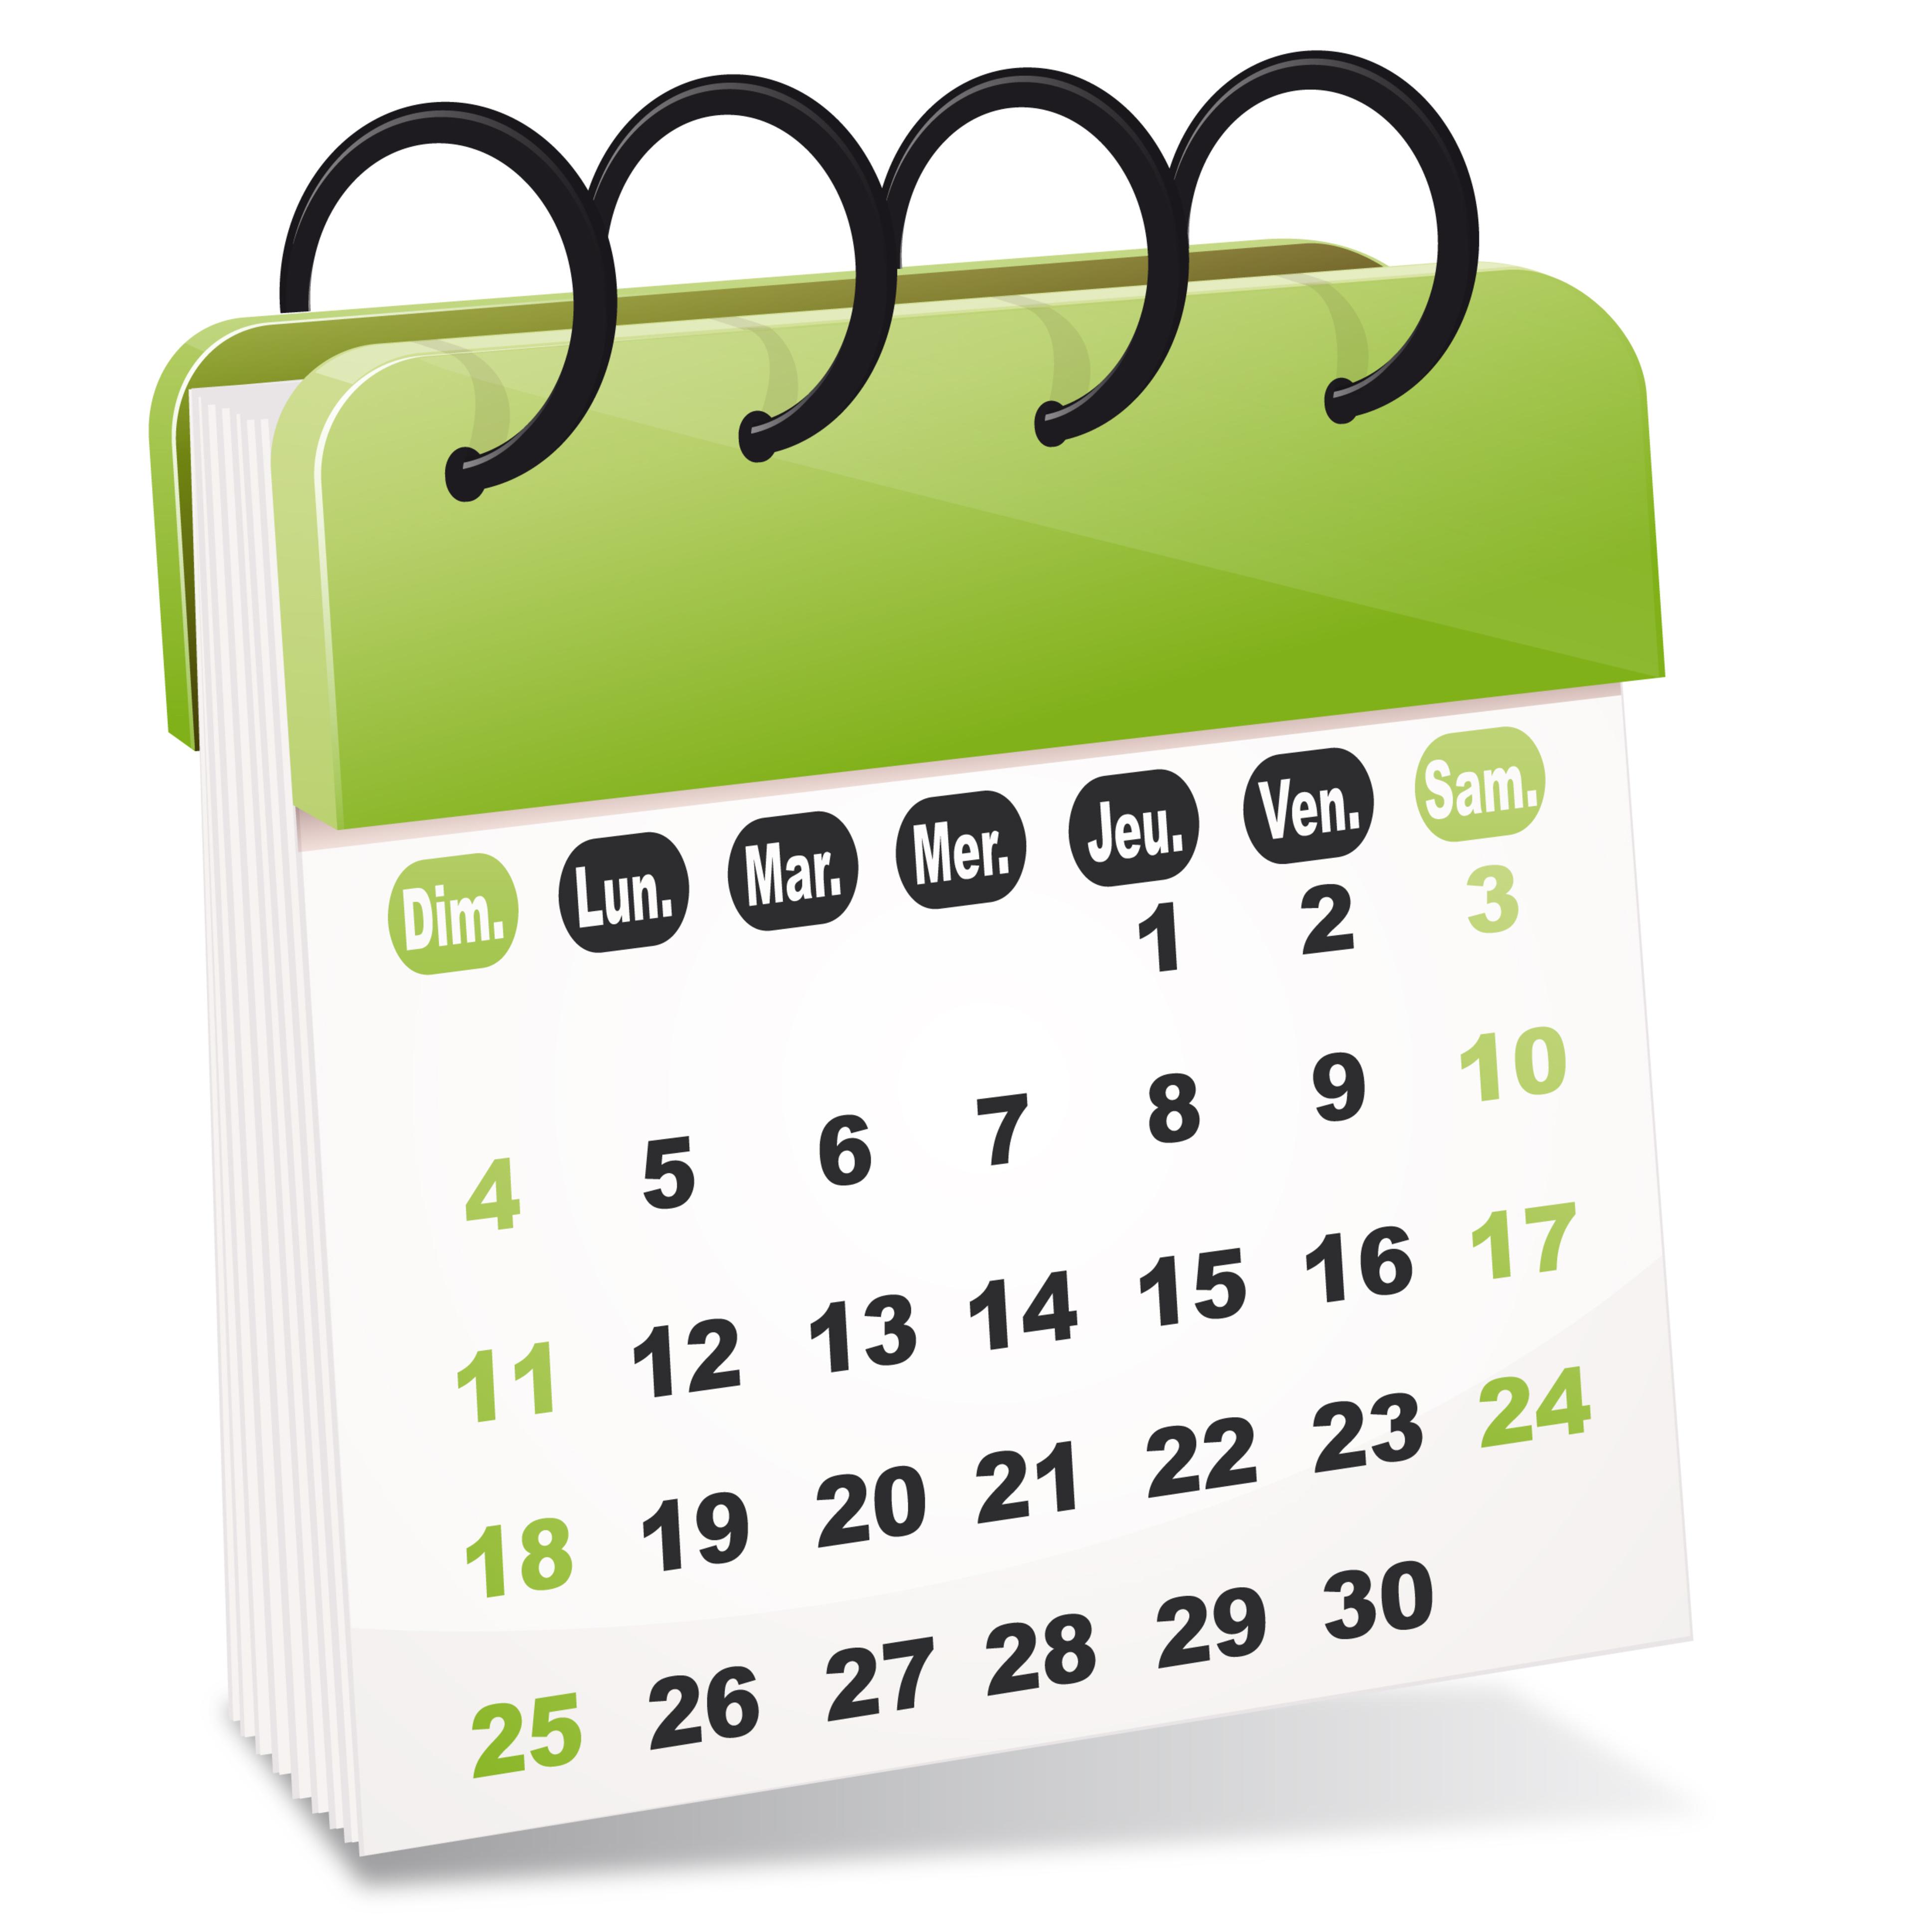 Calendrier rencontre 2cv 2018